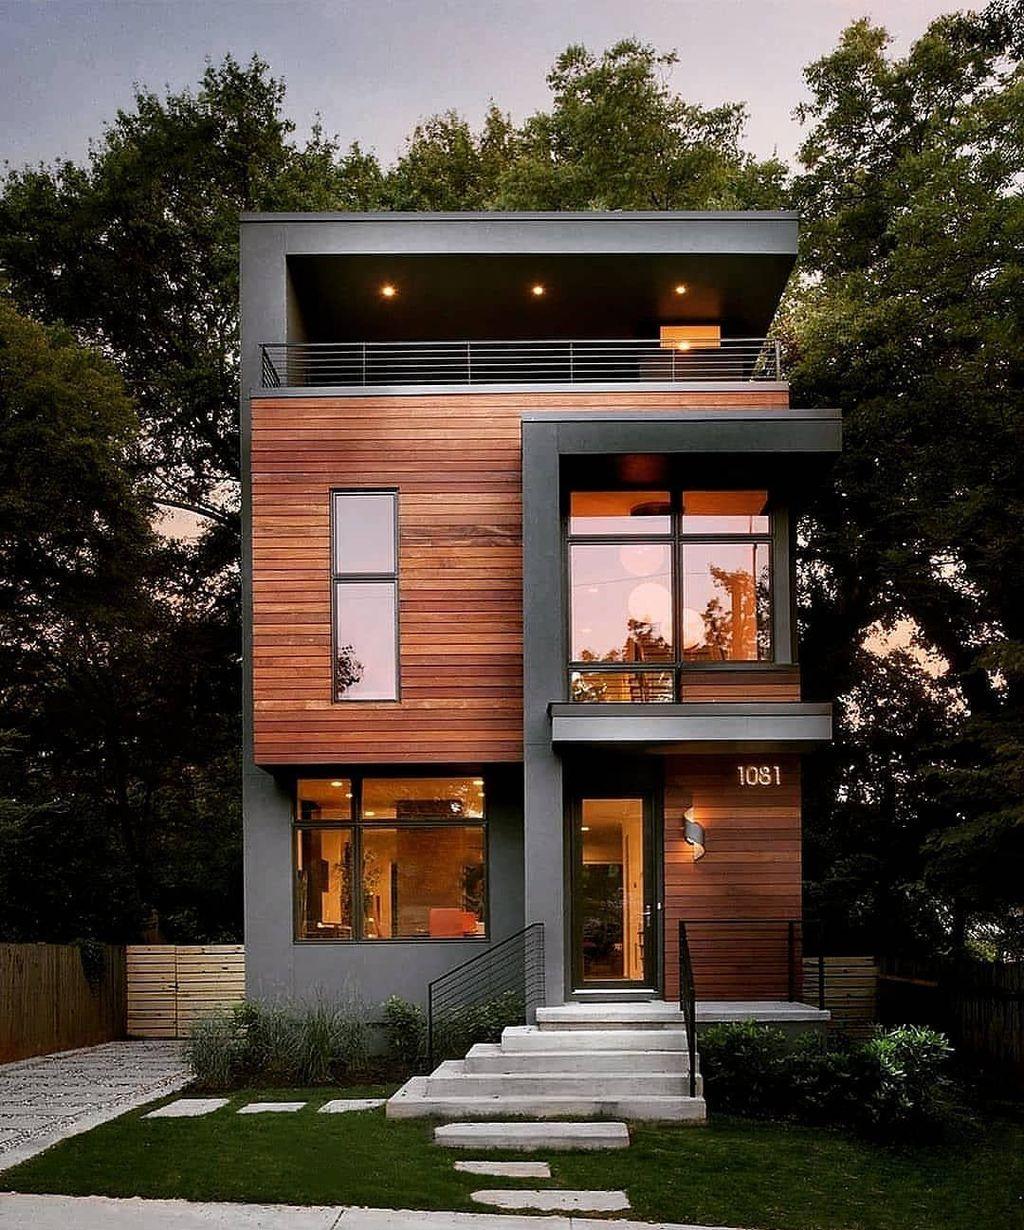 Fasad Rumah Minimalis 2 Lantai